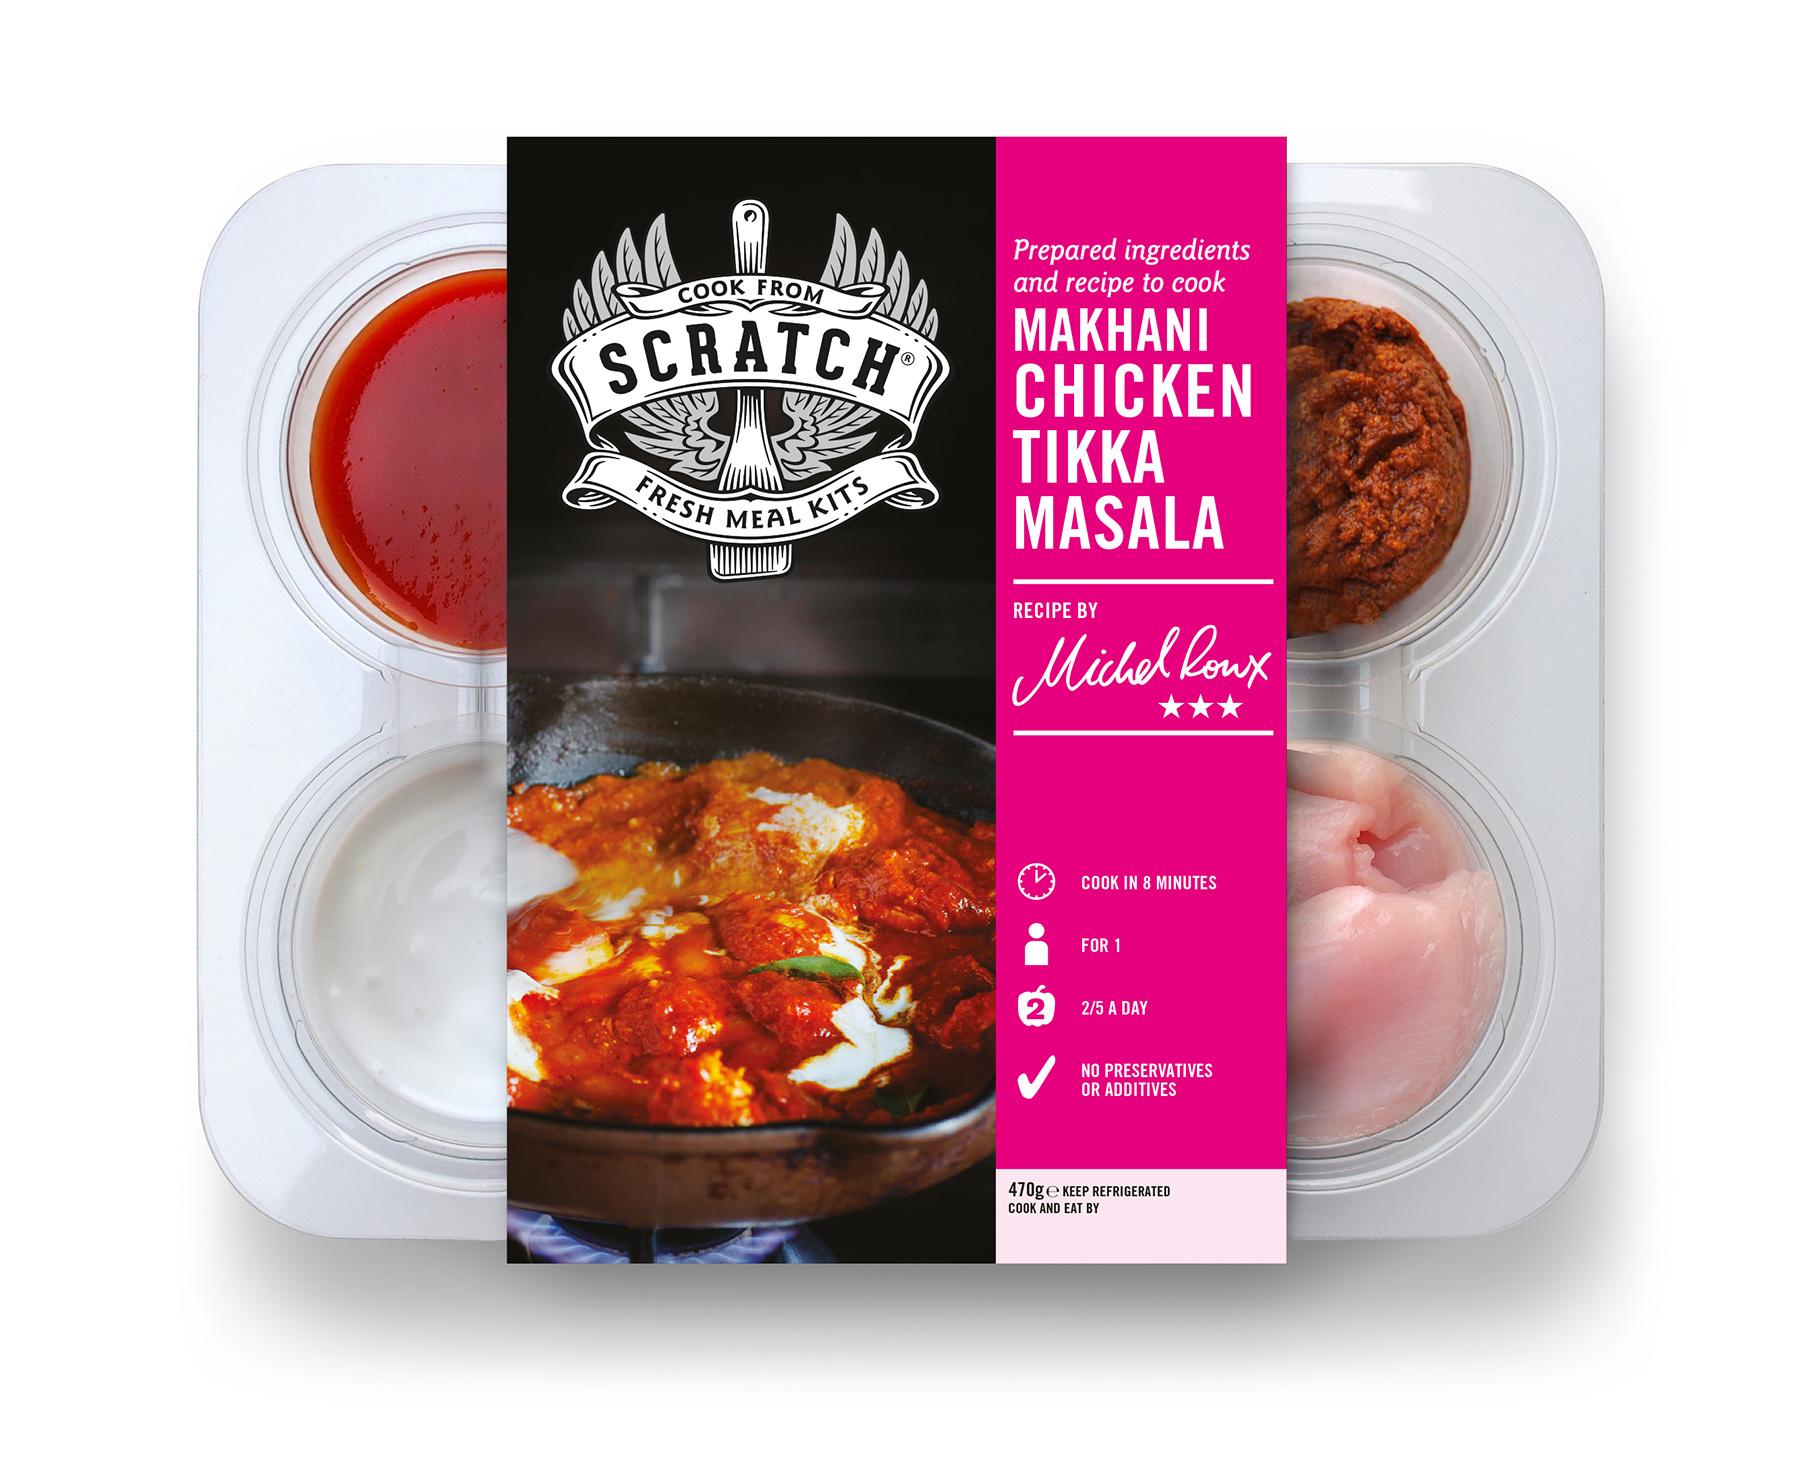 Packaging design for Scratch